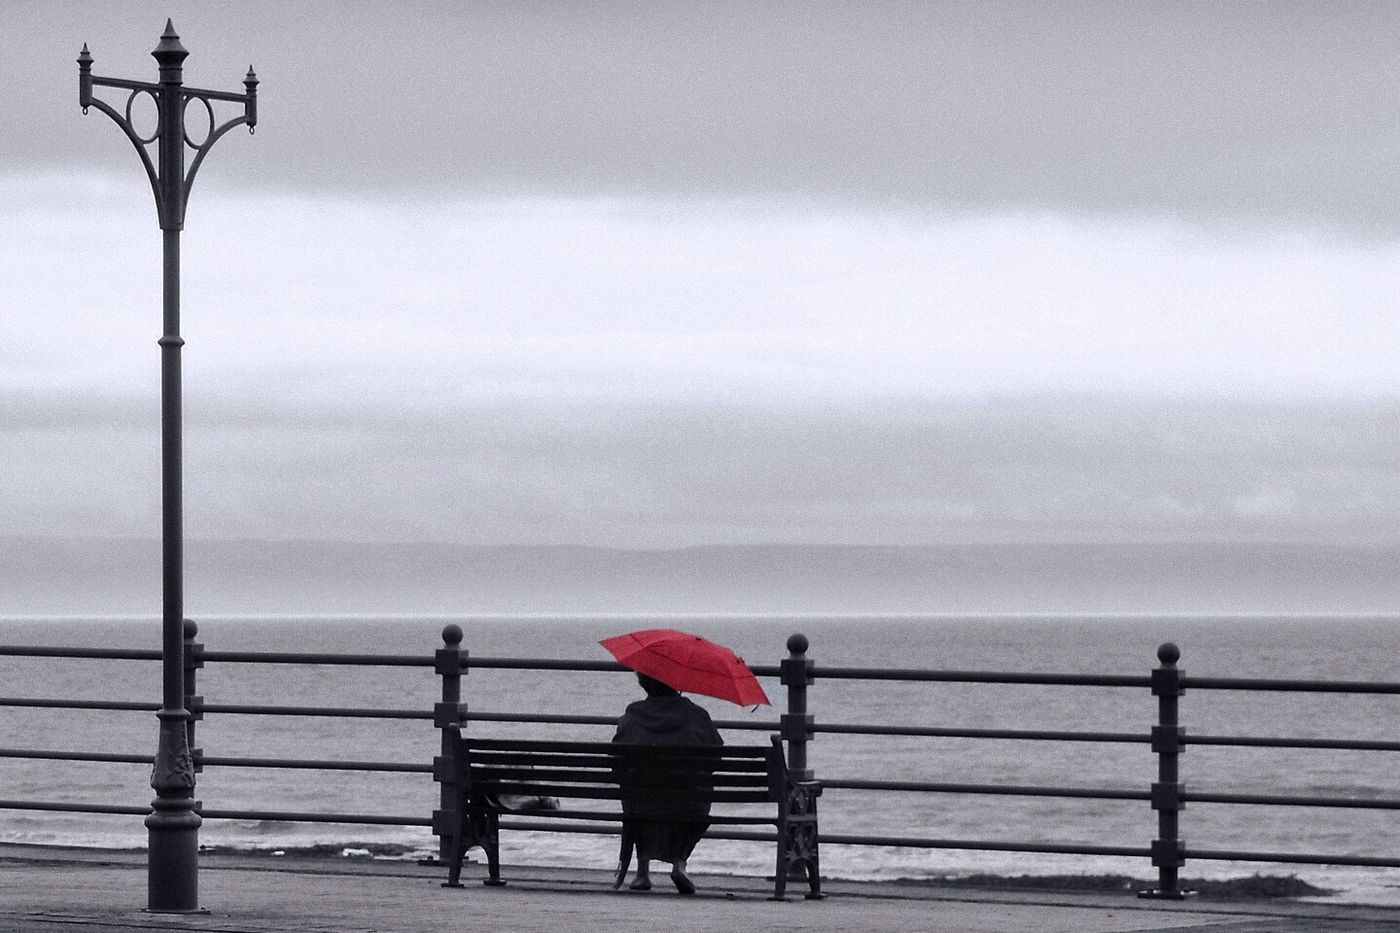 Sitting in the rain. Wales Rain Red